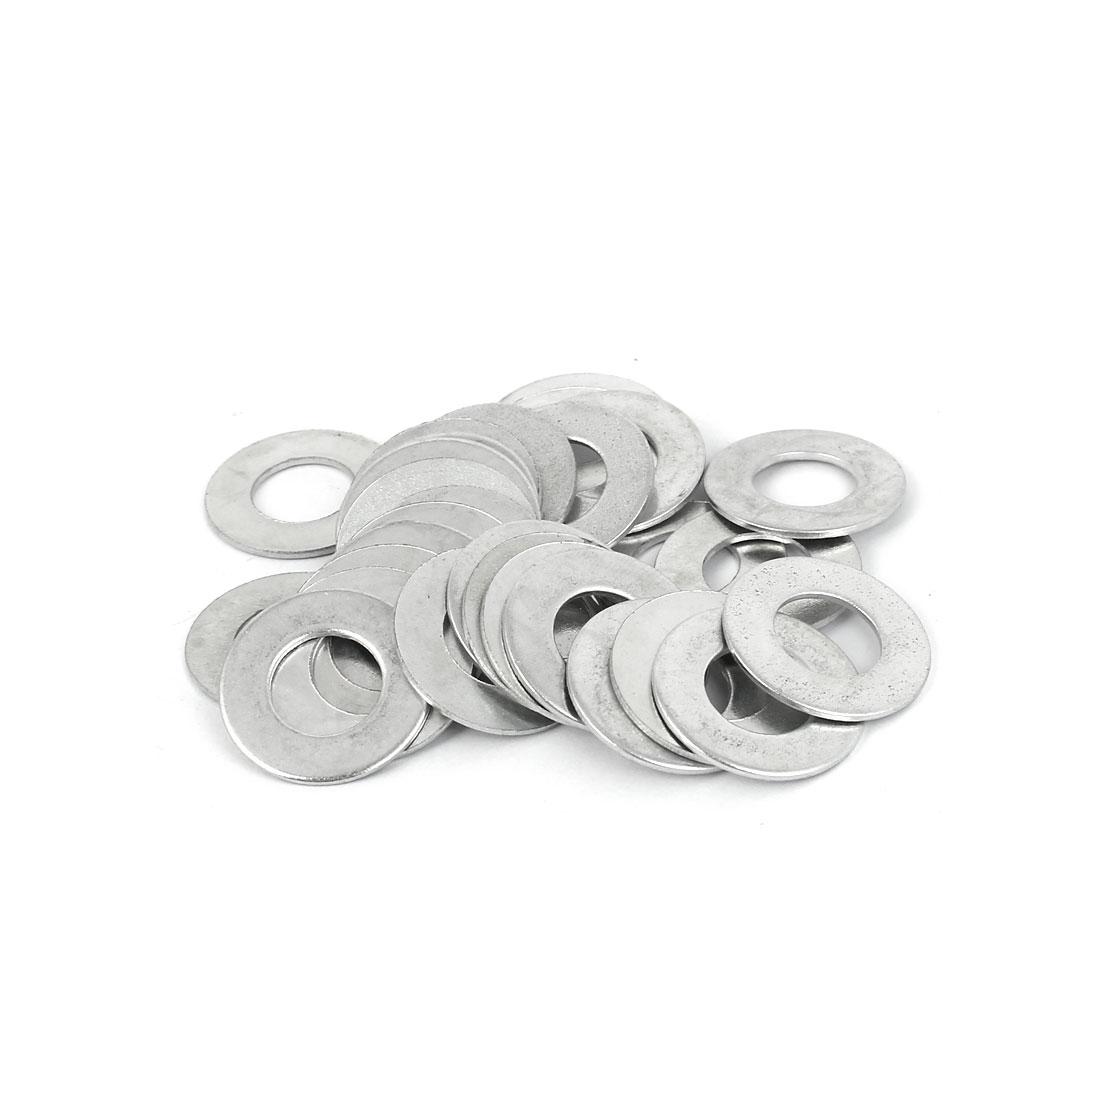 10mm x 20mm x 1mm Zinc Plated Flat Spacers Washers Gaskets Fasteners GB97 30PCS